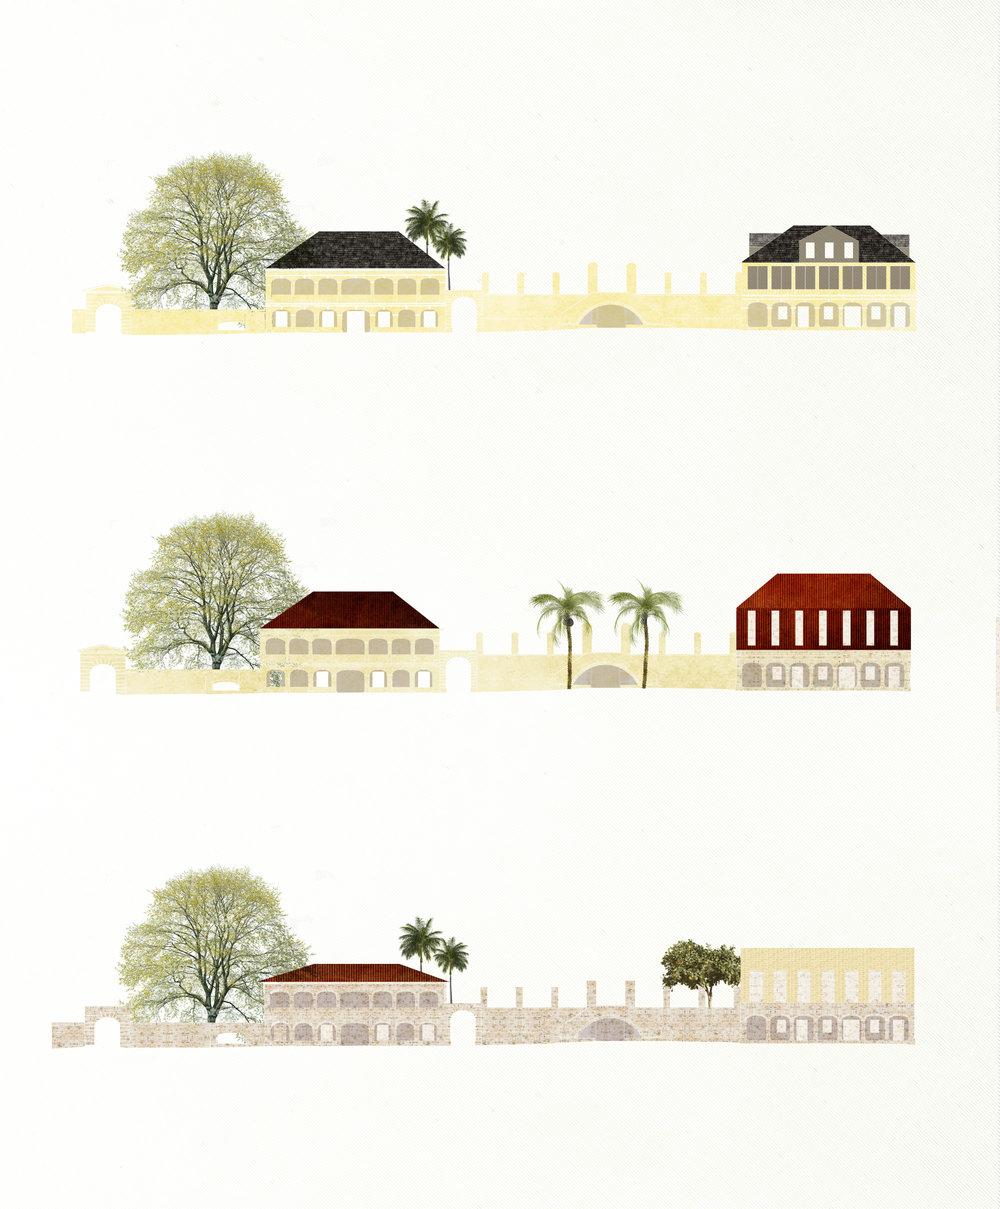 Fasadediagrammer St Croix[1].jpg